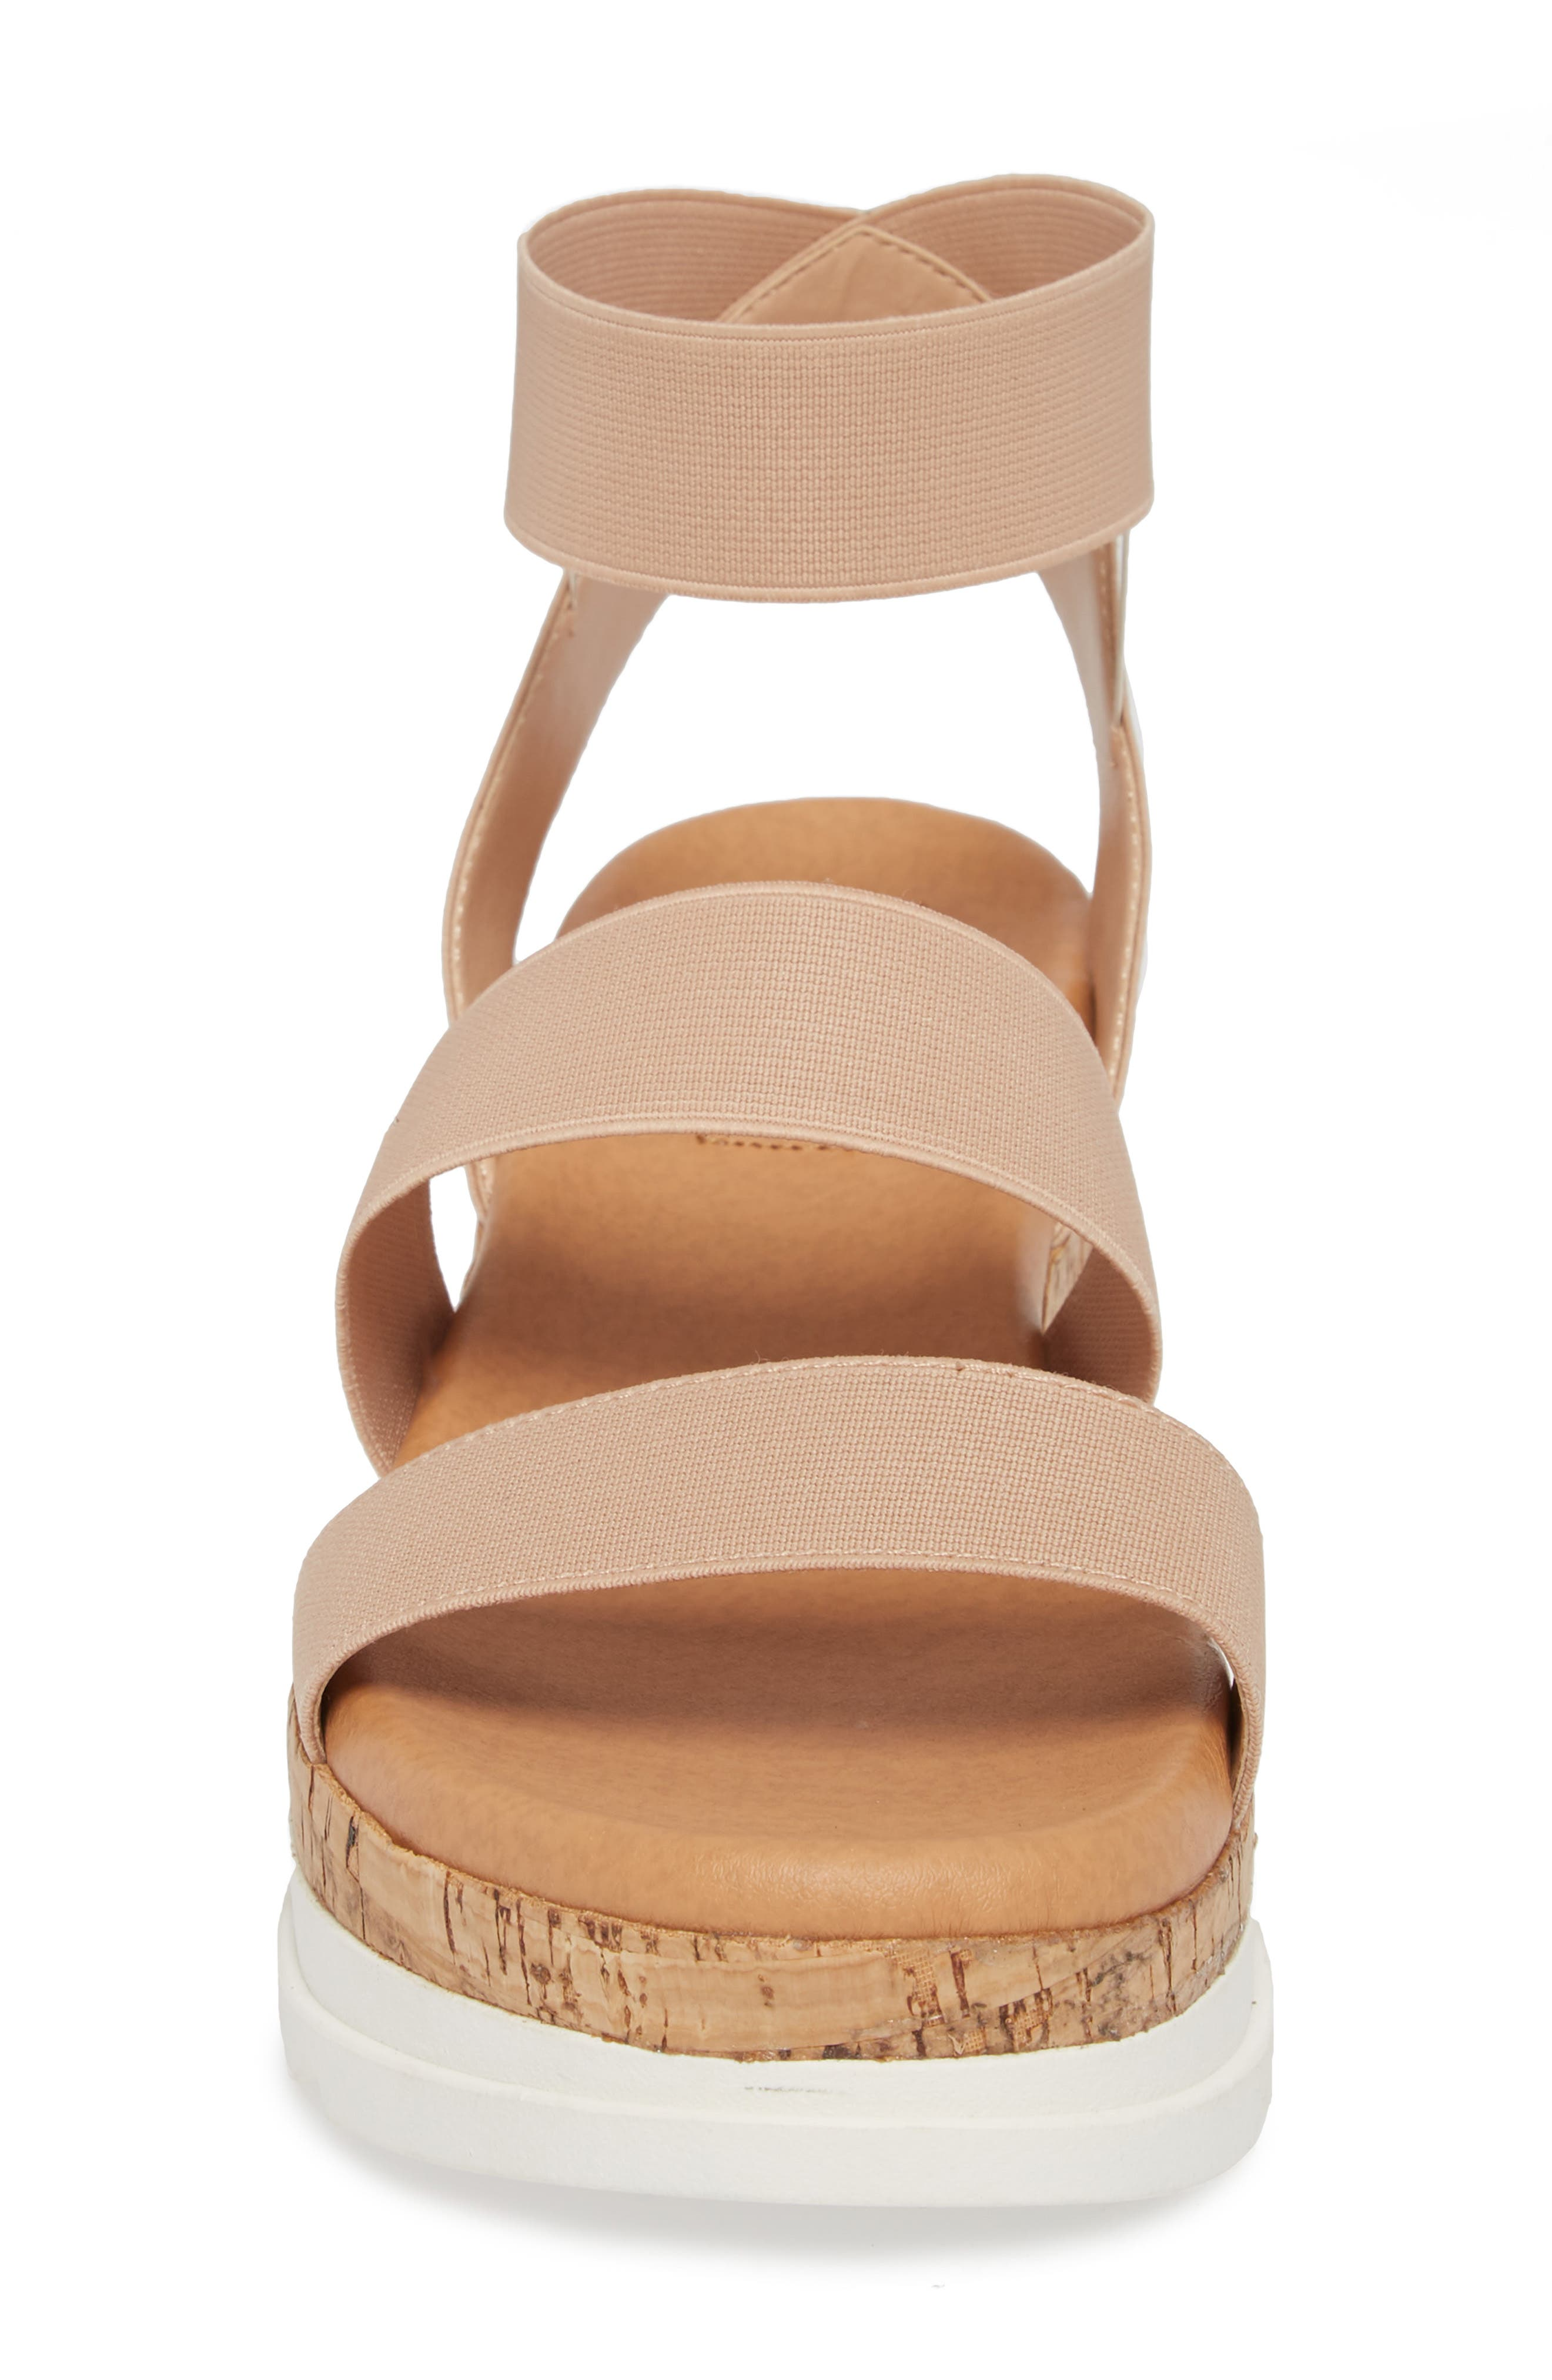 Bandi Platform Wedge Sandal,                             Alternate thumbnail 4, color,                             Blush